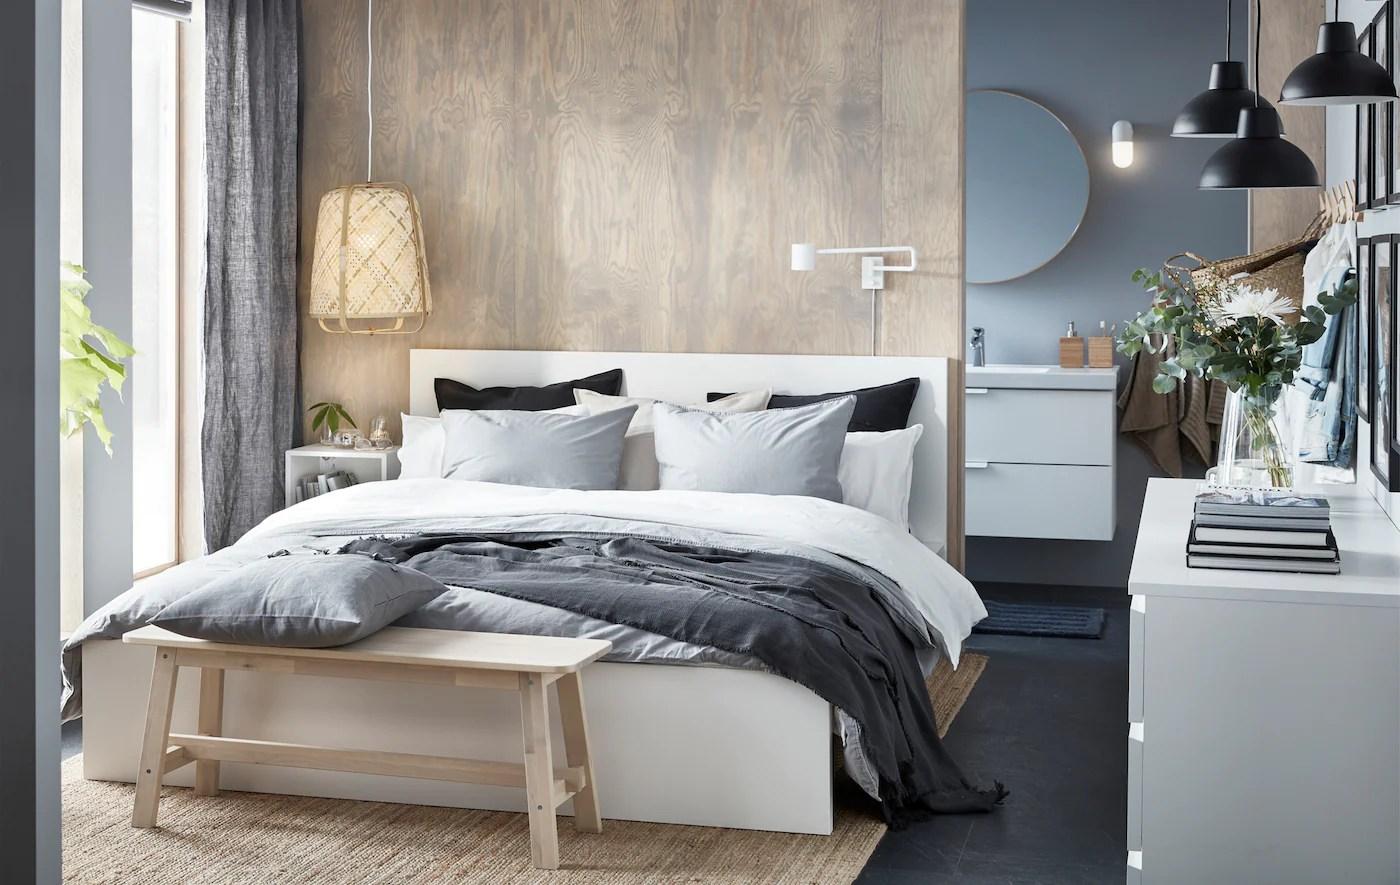 minimaliste pour une petite chambre ikea